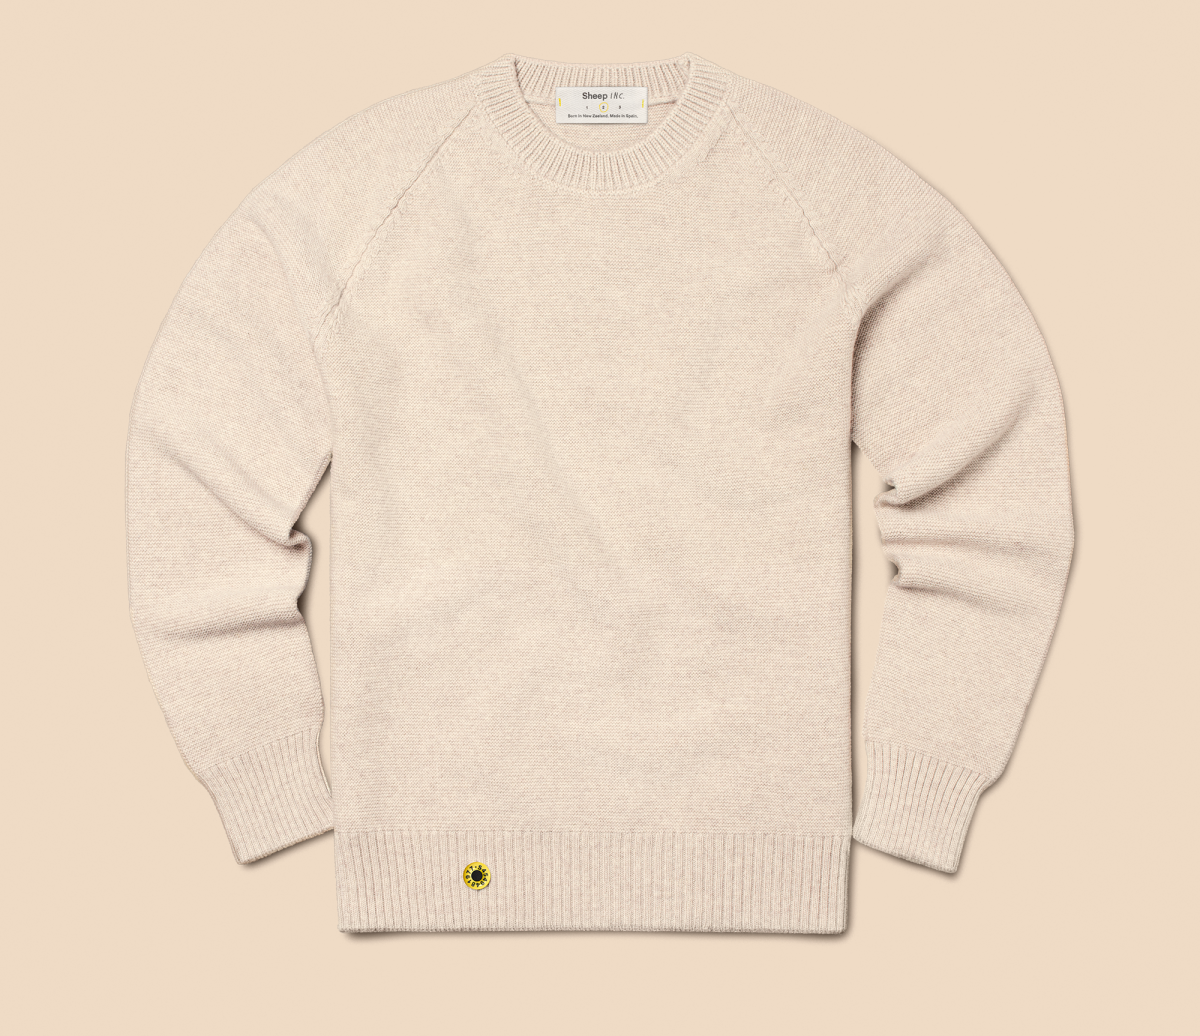 A Sheep Inc. sweater. Photo: Courtesy of Sheep Inc.